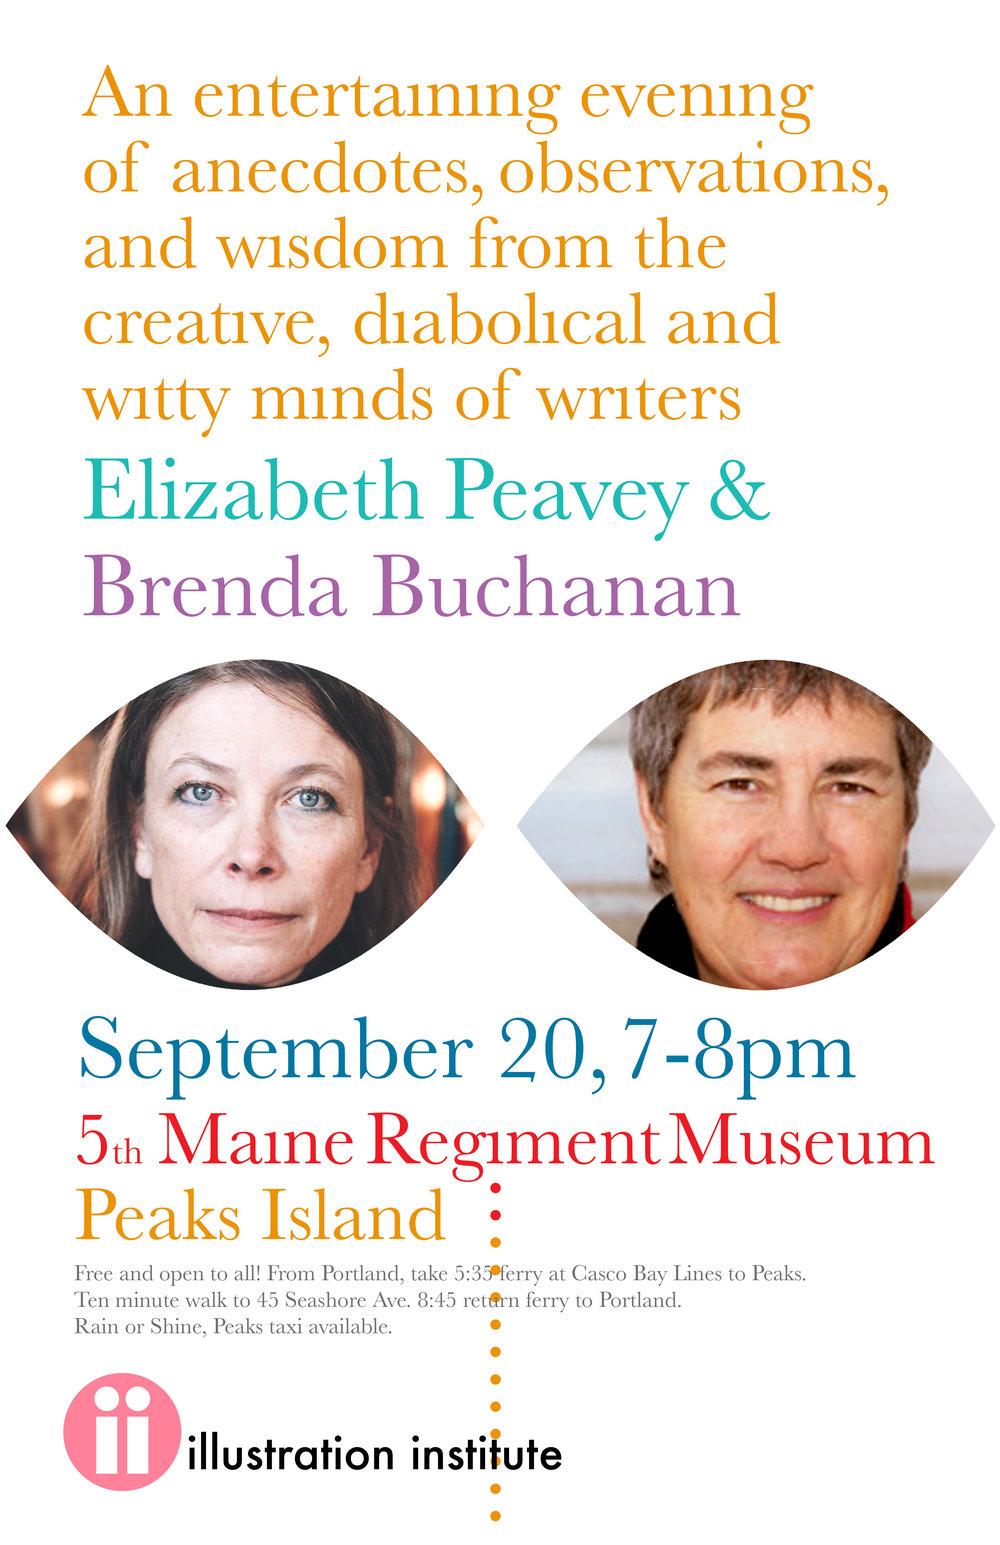 Elizabeth Peavey Brenda Buchanan poster.jpg